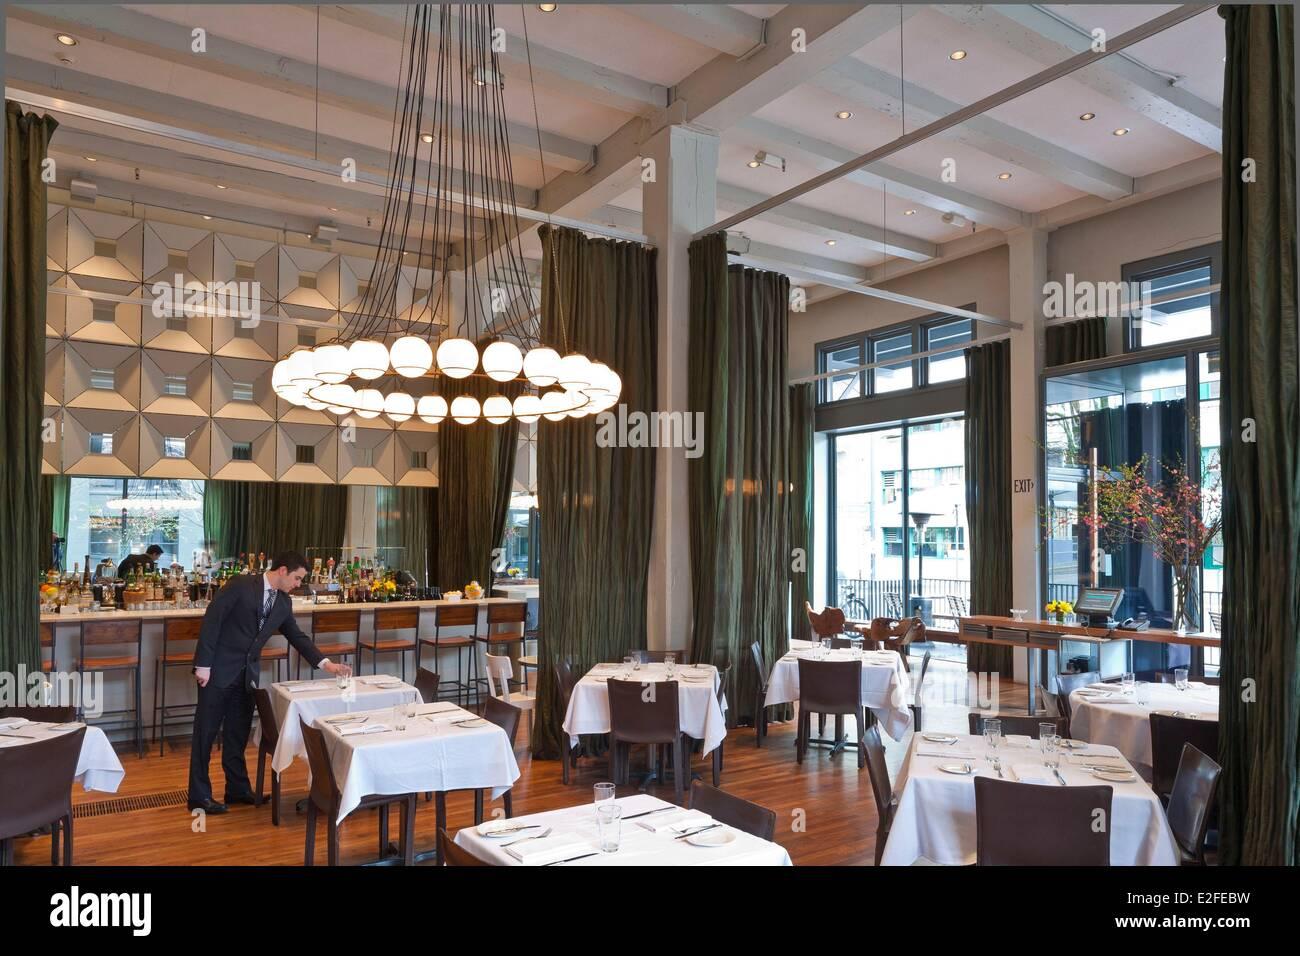 United States, Oregon, Portland, Pearl District, Bluehour restaurant designed by architect Brad Cloepl - Stock Image